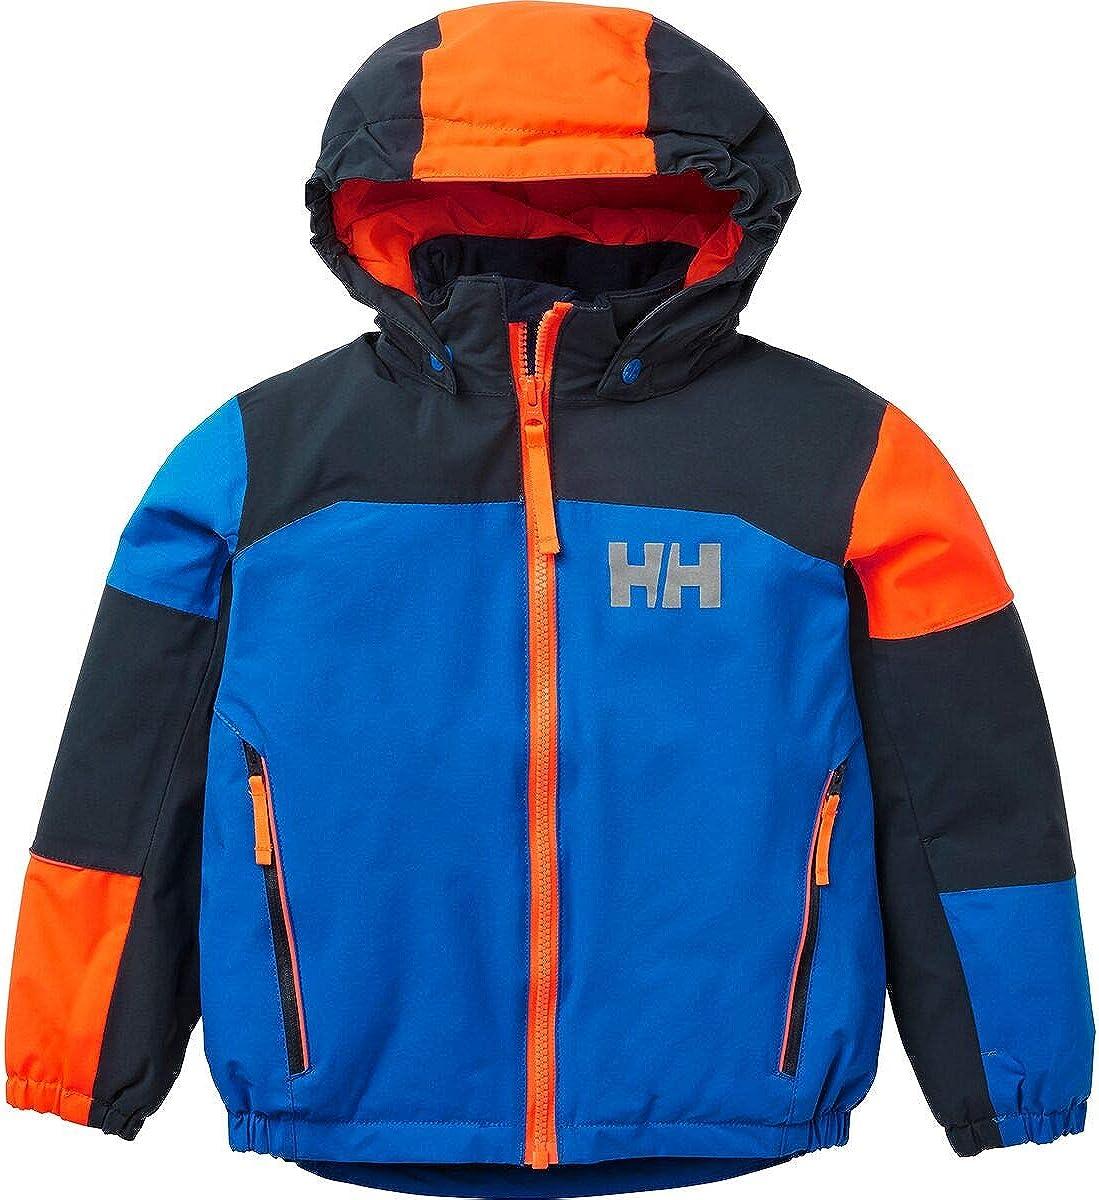 Bambini Unisex Helly Hansen Rider 2 Ins Jacke Giacca per bambini